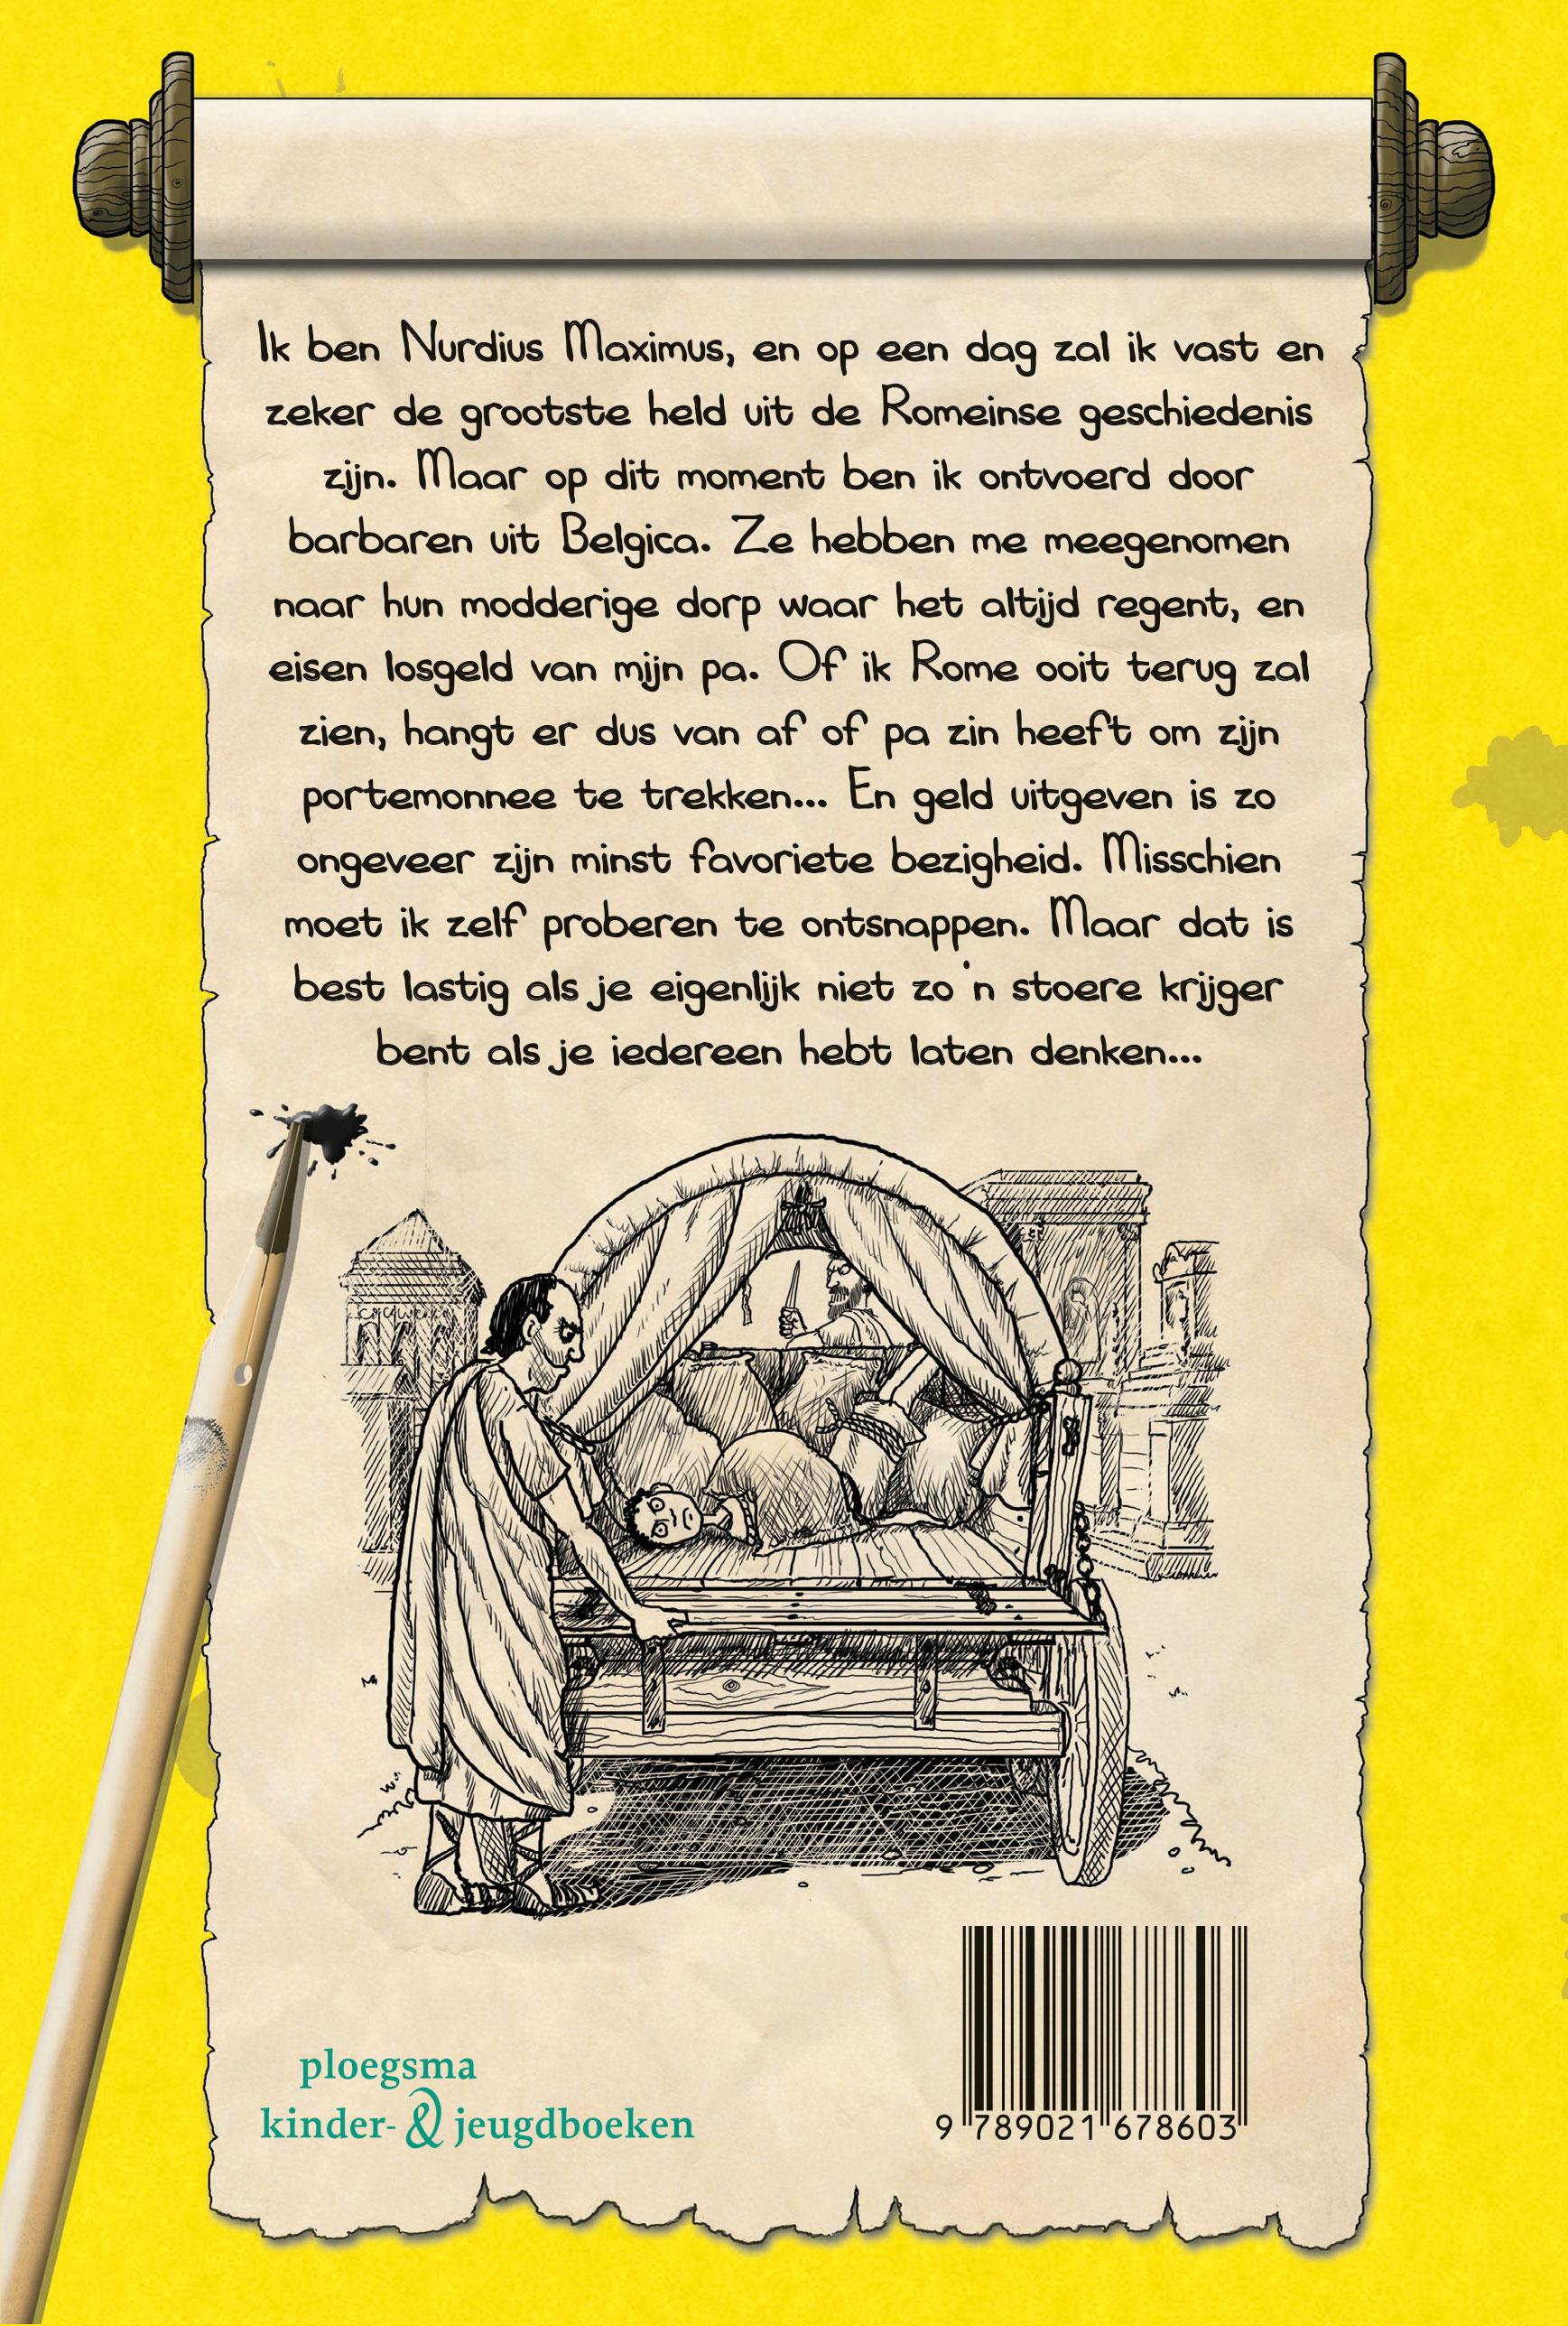 Het dagboek van Nurdius Maximus in Belgica